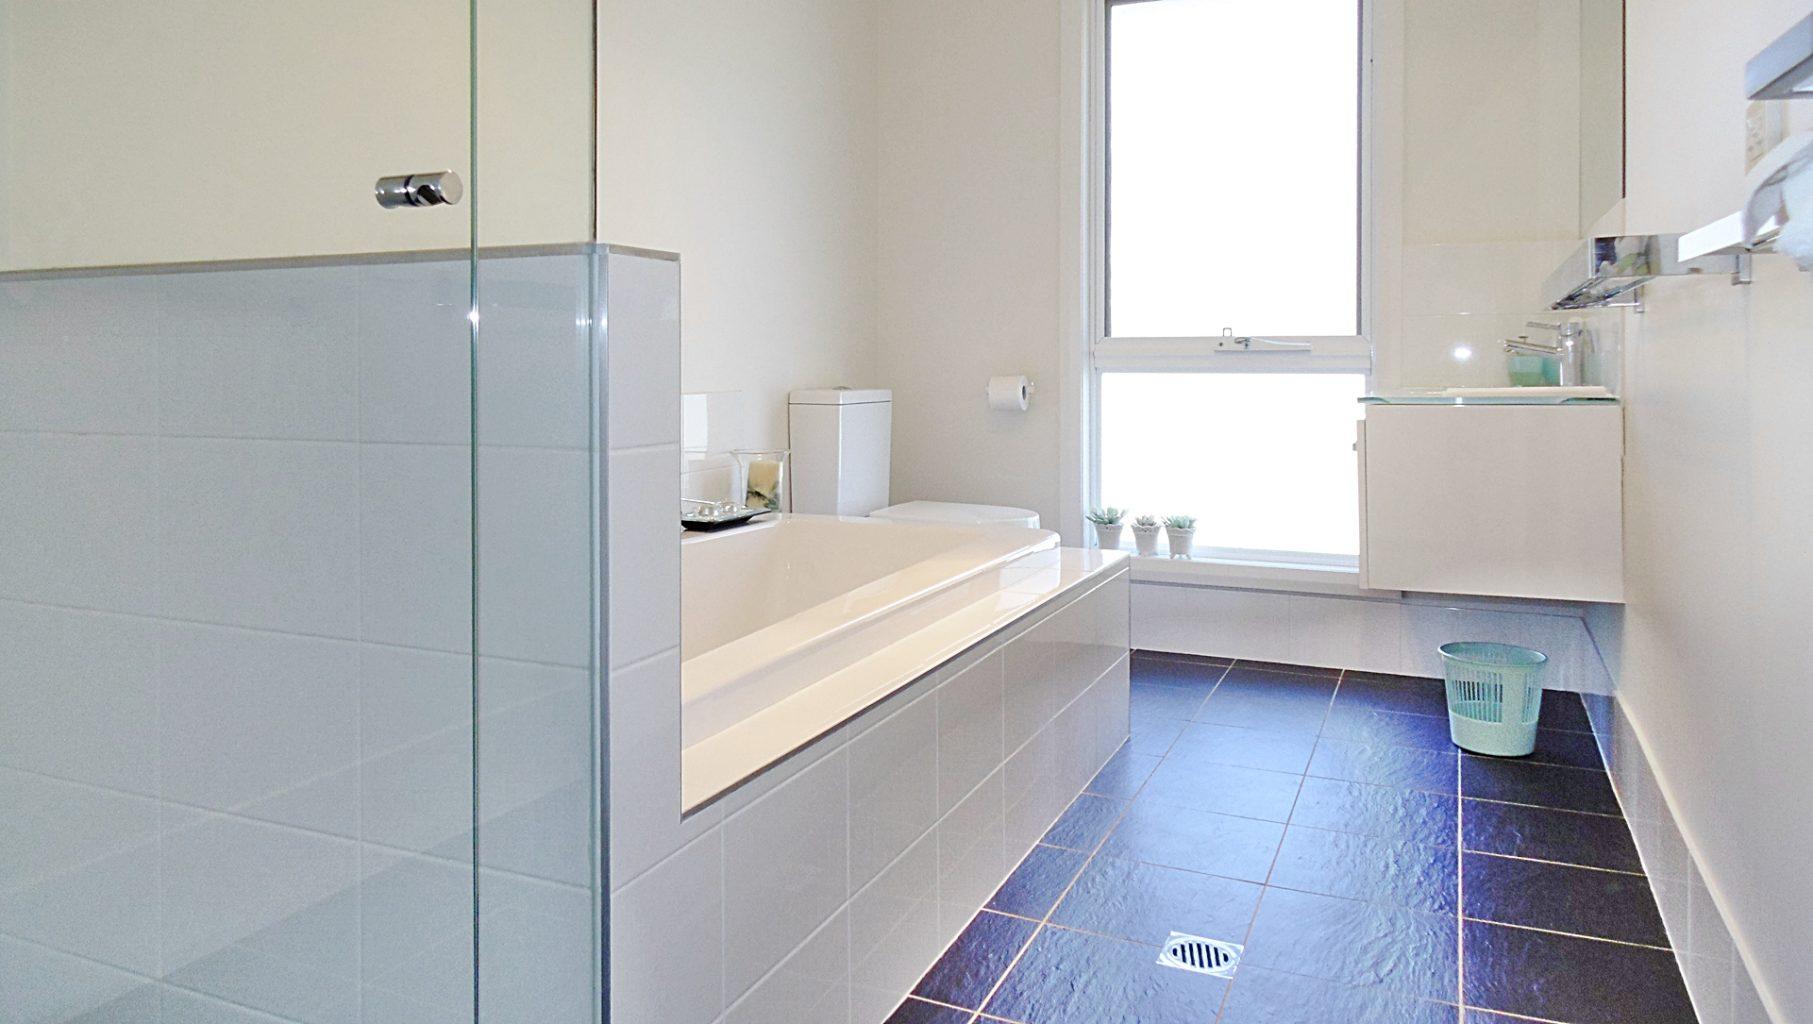 Allure Bathroom